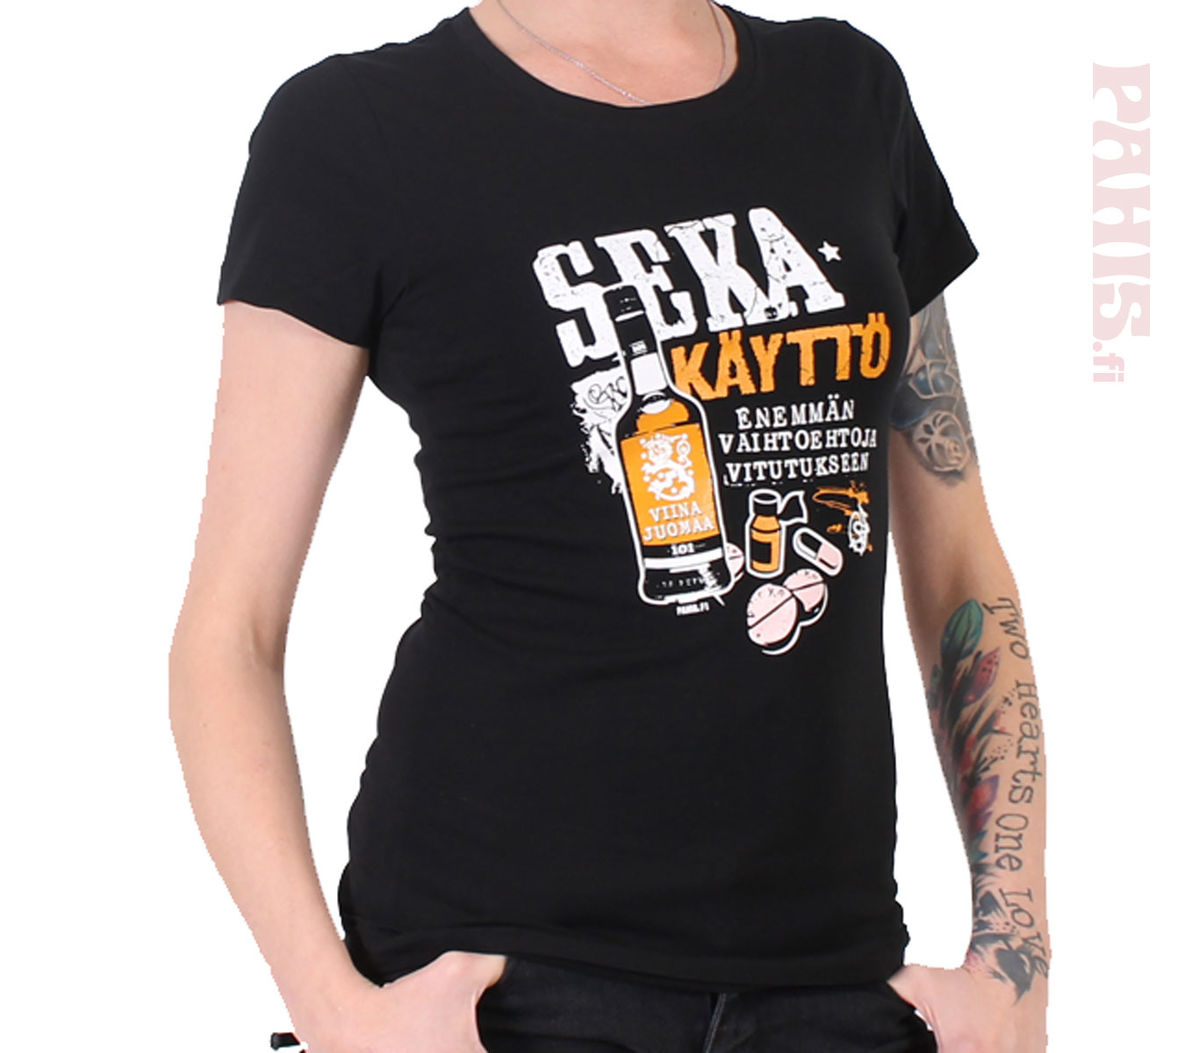 ... Naisten huumori T-paidat ... e26b250a2e